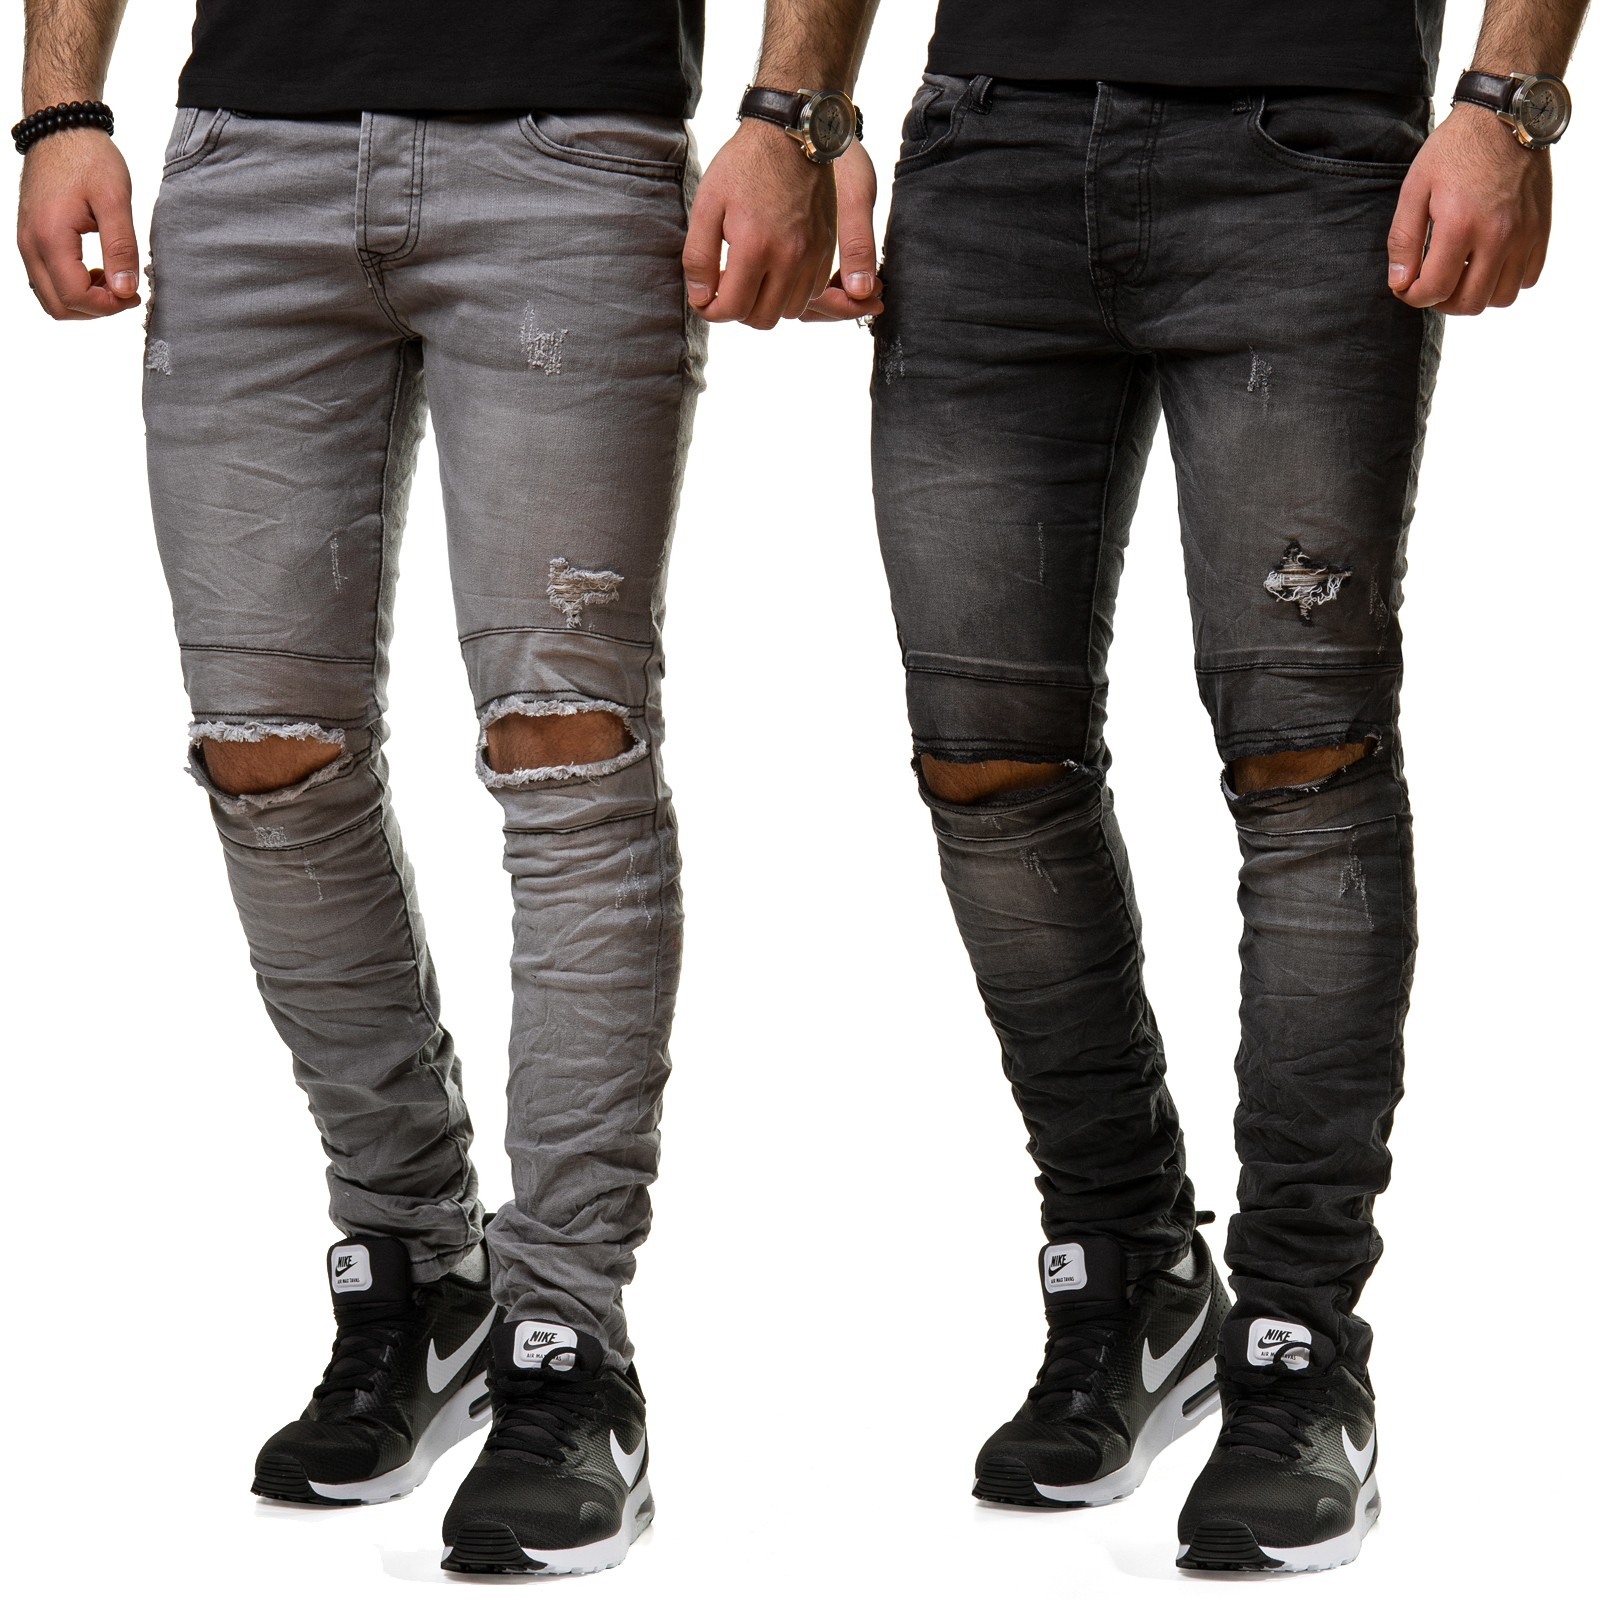 zerrissene jeans damen zerrissene jeans mit engem bein. Black Bedroom Furniture Sets. Home Design Ideas